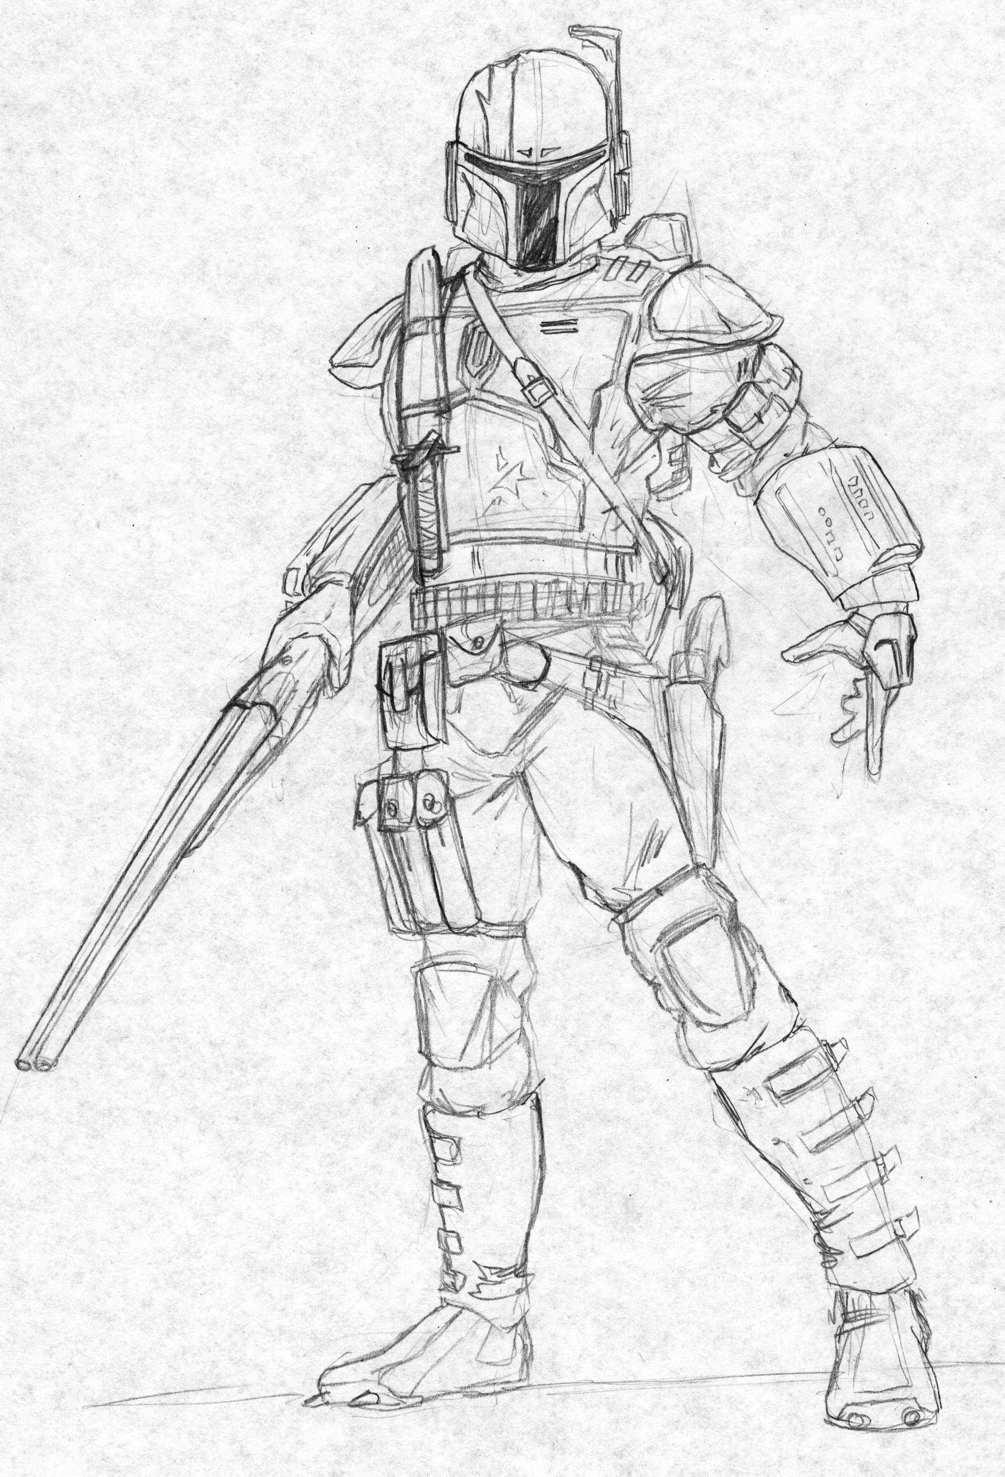 Mandalorian Slug-gunner by Kuk-Man